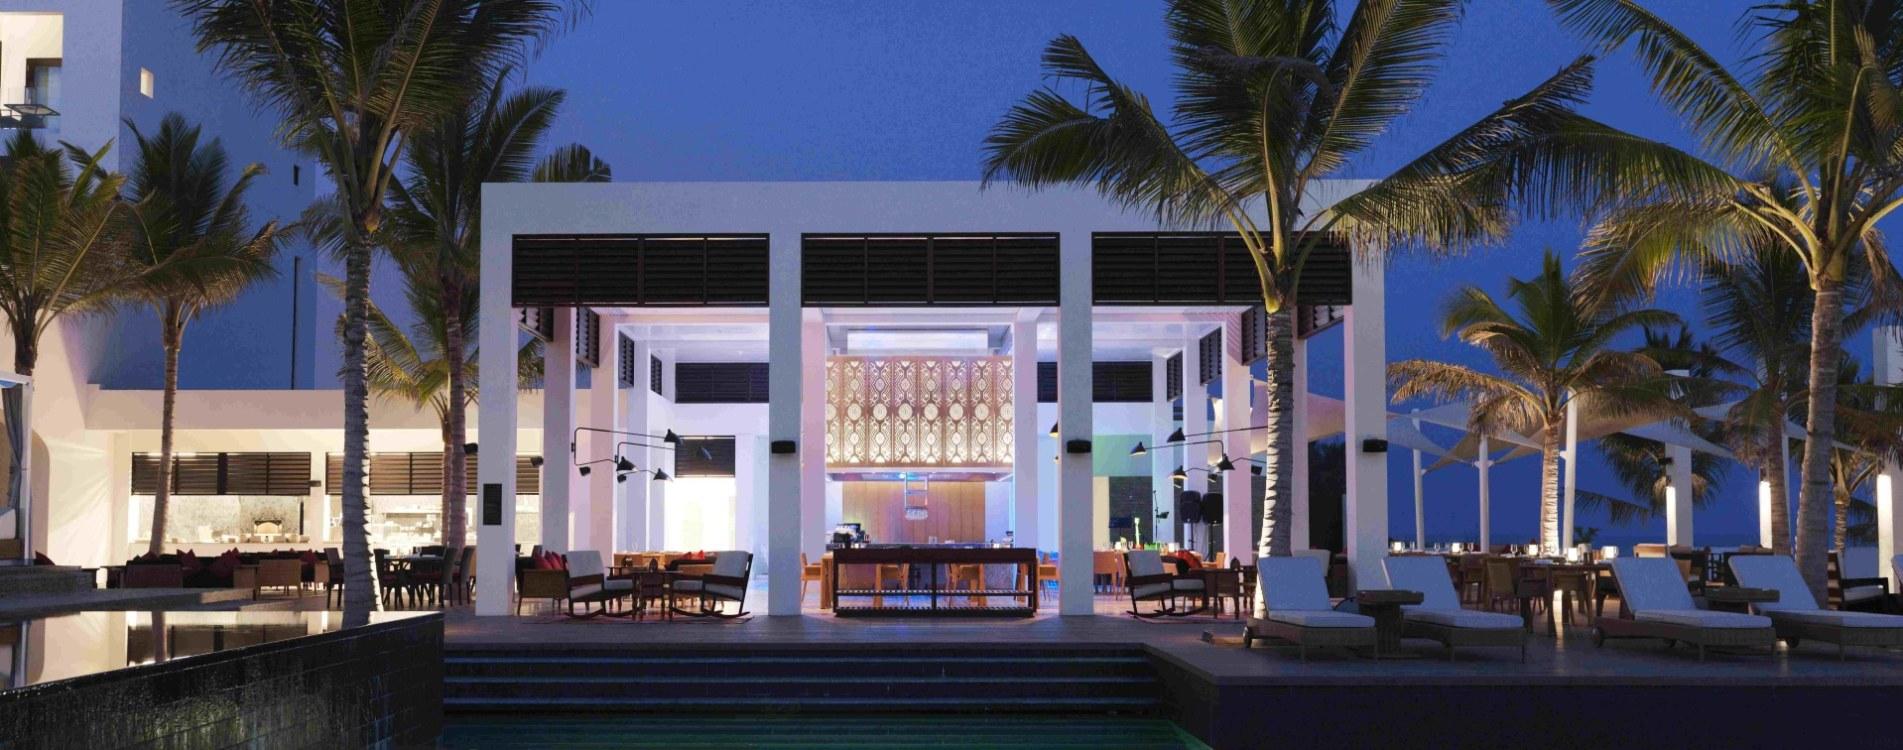 Al-Baleed-Resort-Salalah-By-Anantara-Al-Mina-Restaurant-Exterior.jpg